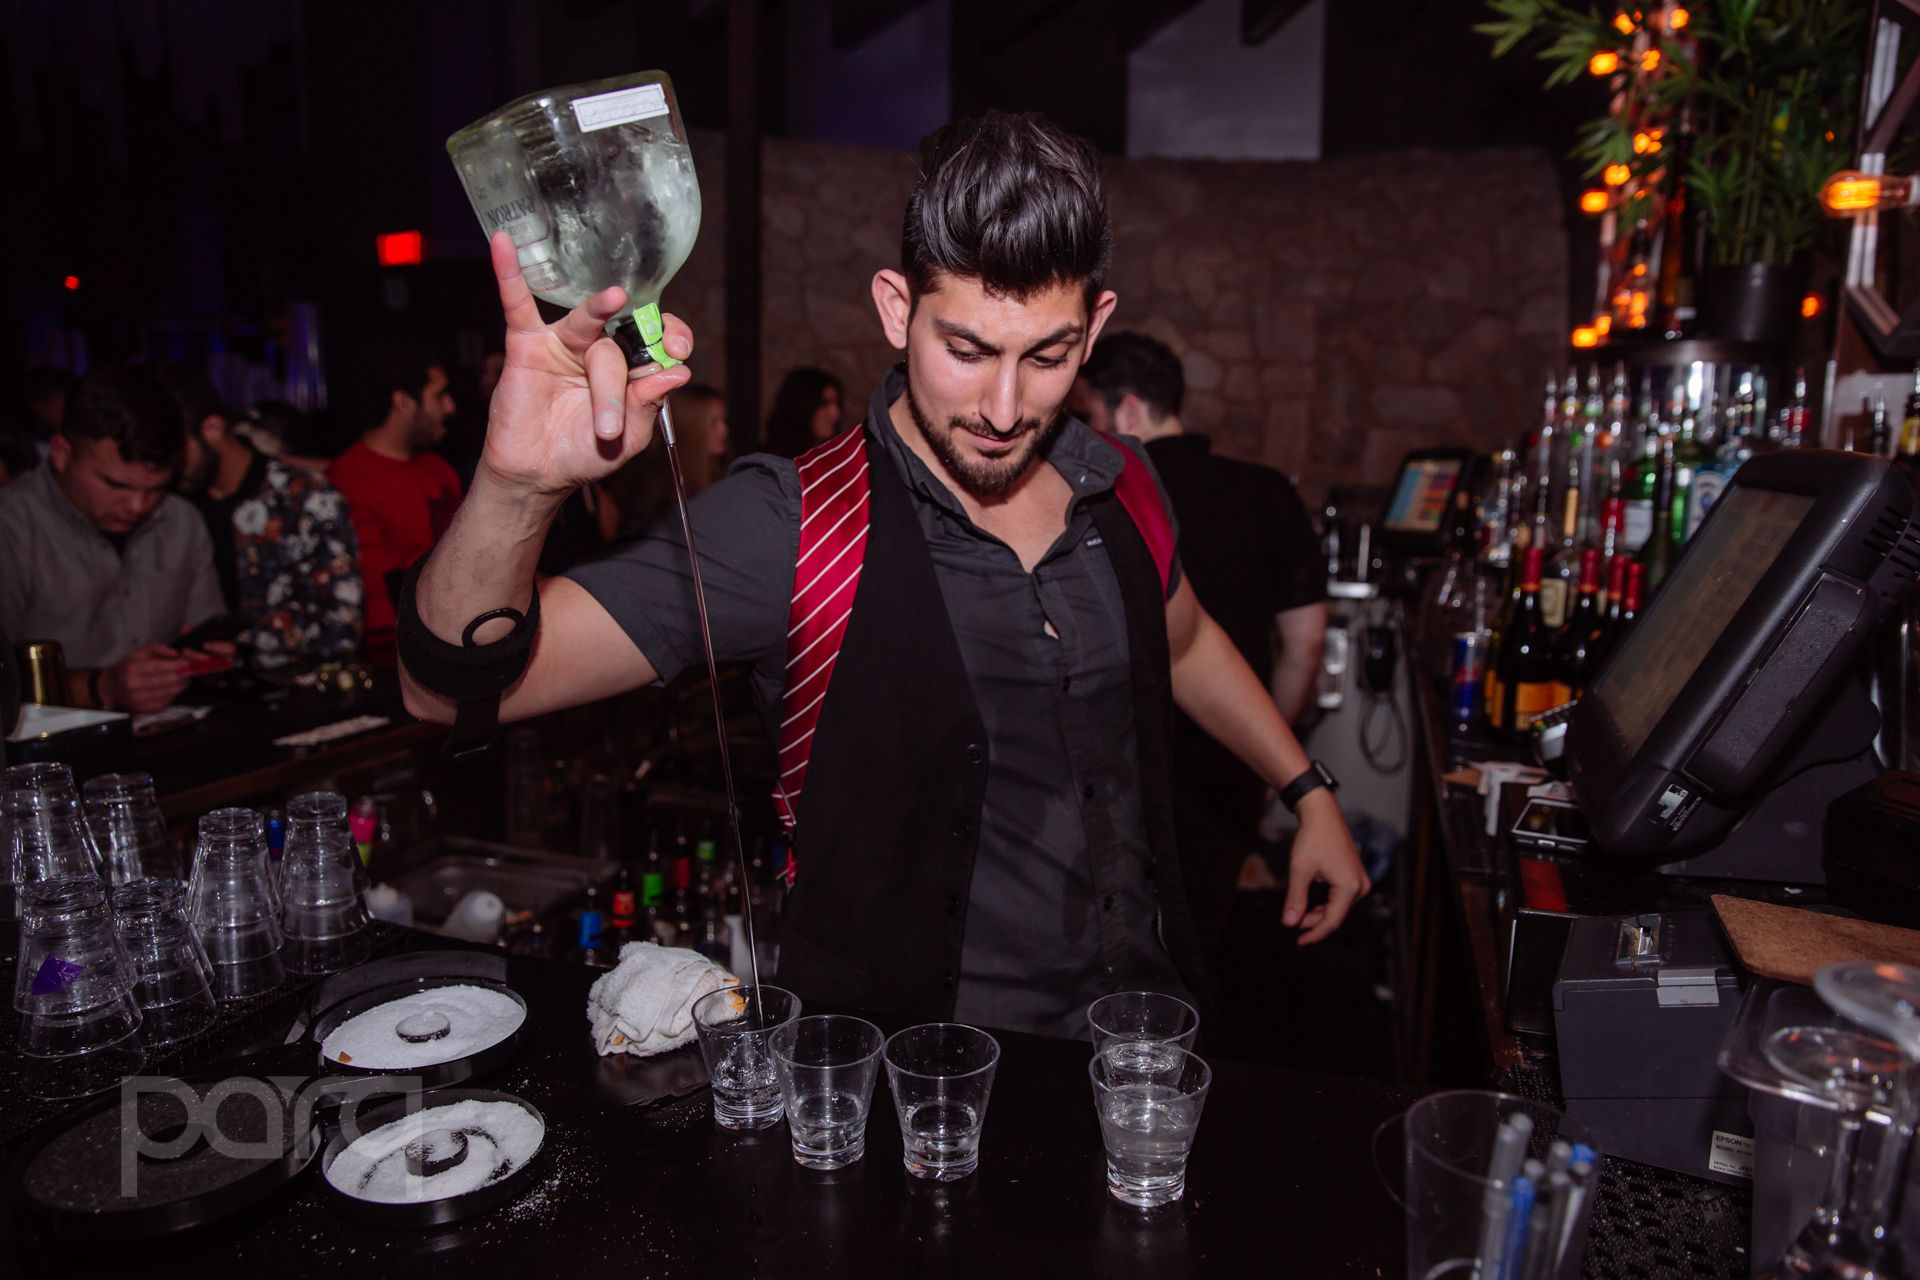 01.19.18 Parq - DJ Hollywood-8.jpg